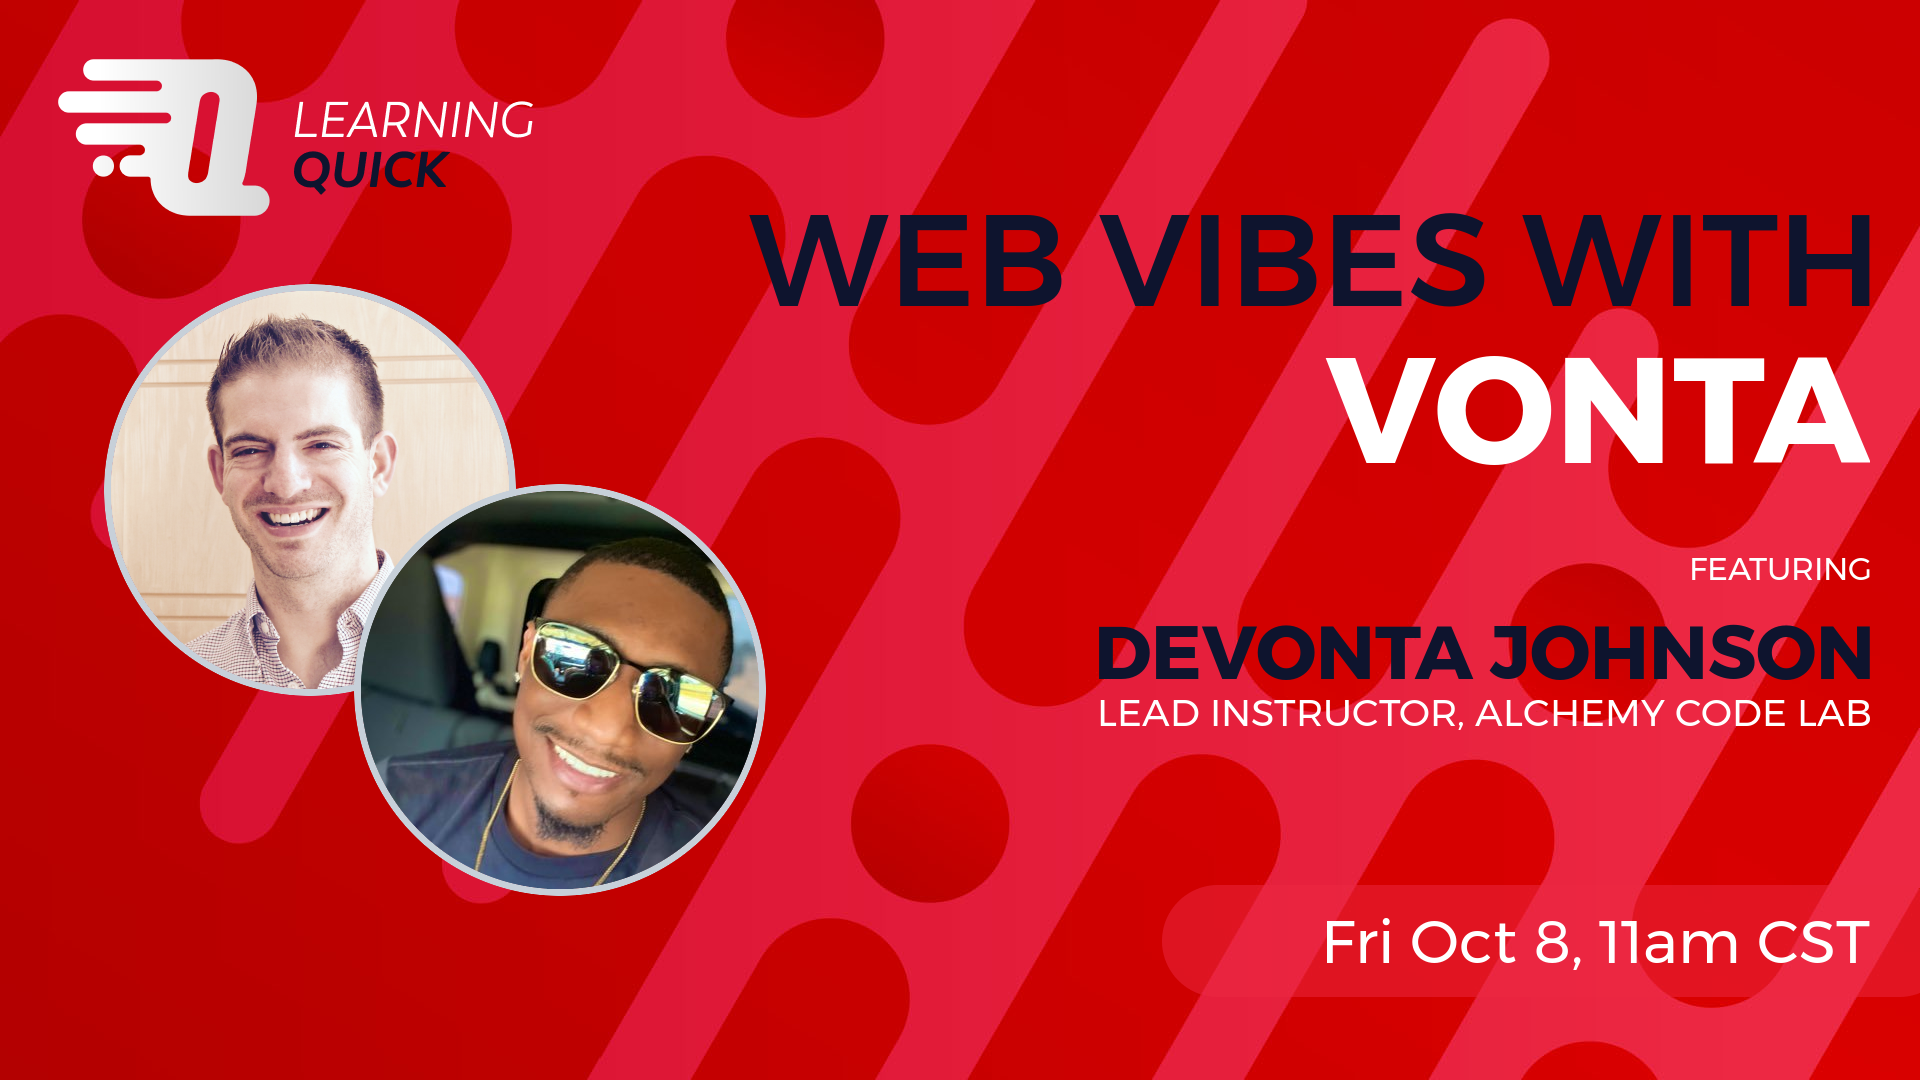 Web Vibes with Vonta with DeVonta Johnson